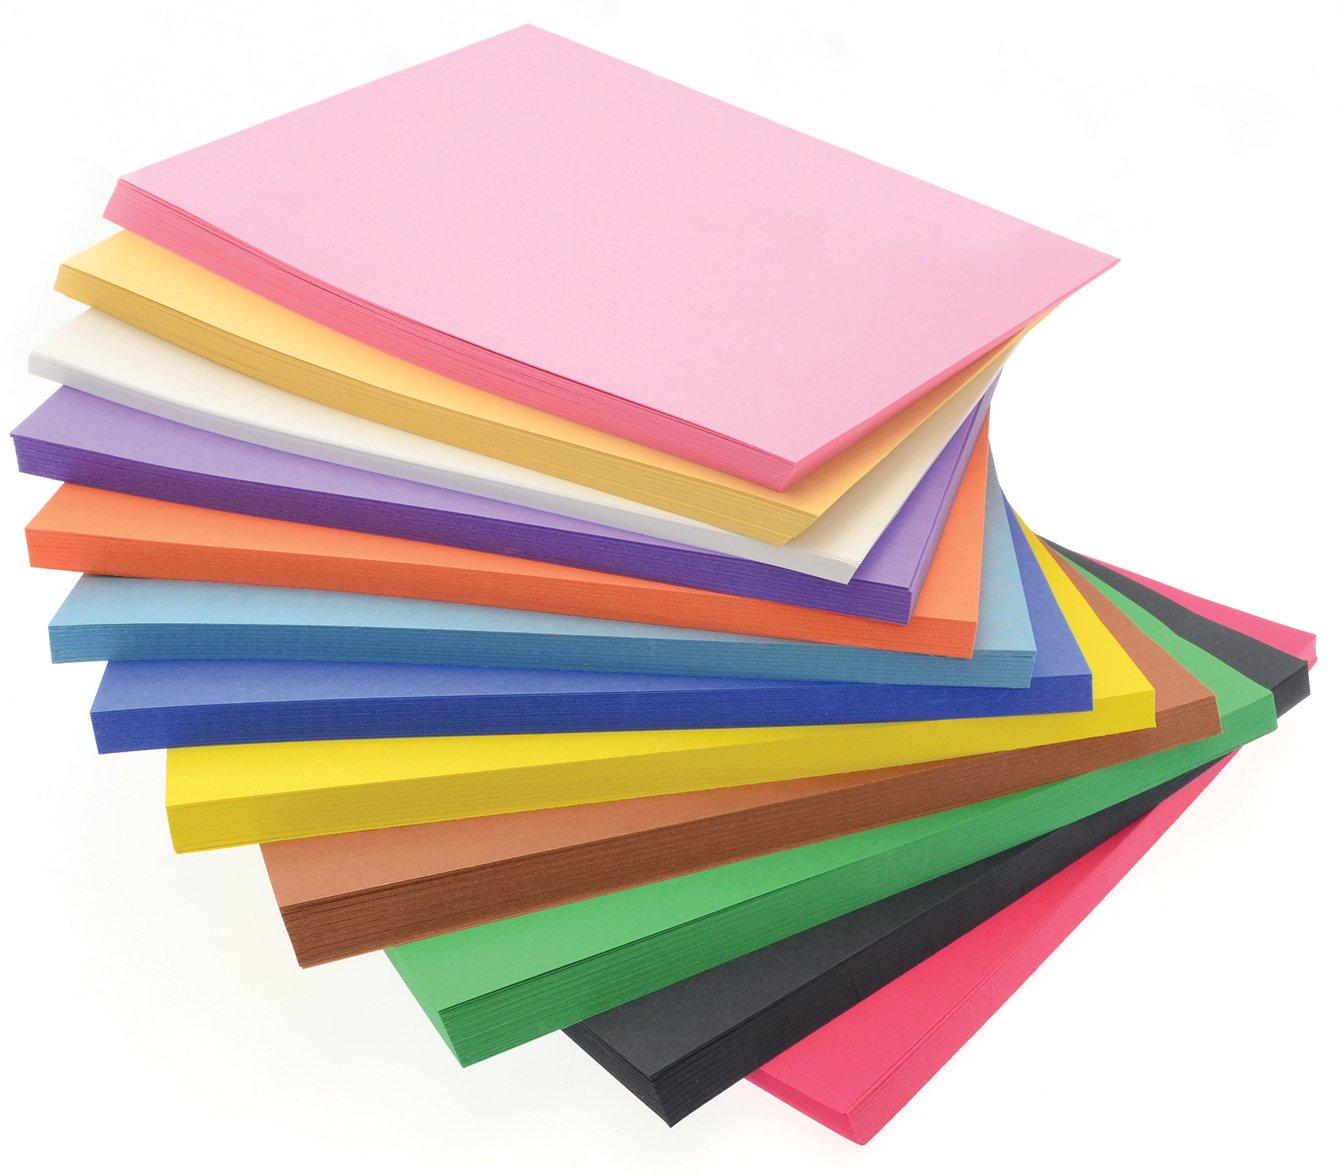 Super Value Paper Stack  500 Sheets A4+ Construction Paper Activity Paper in 10 Vivid Colours